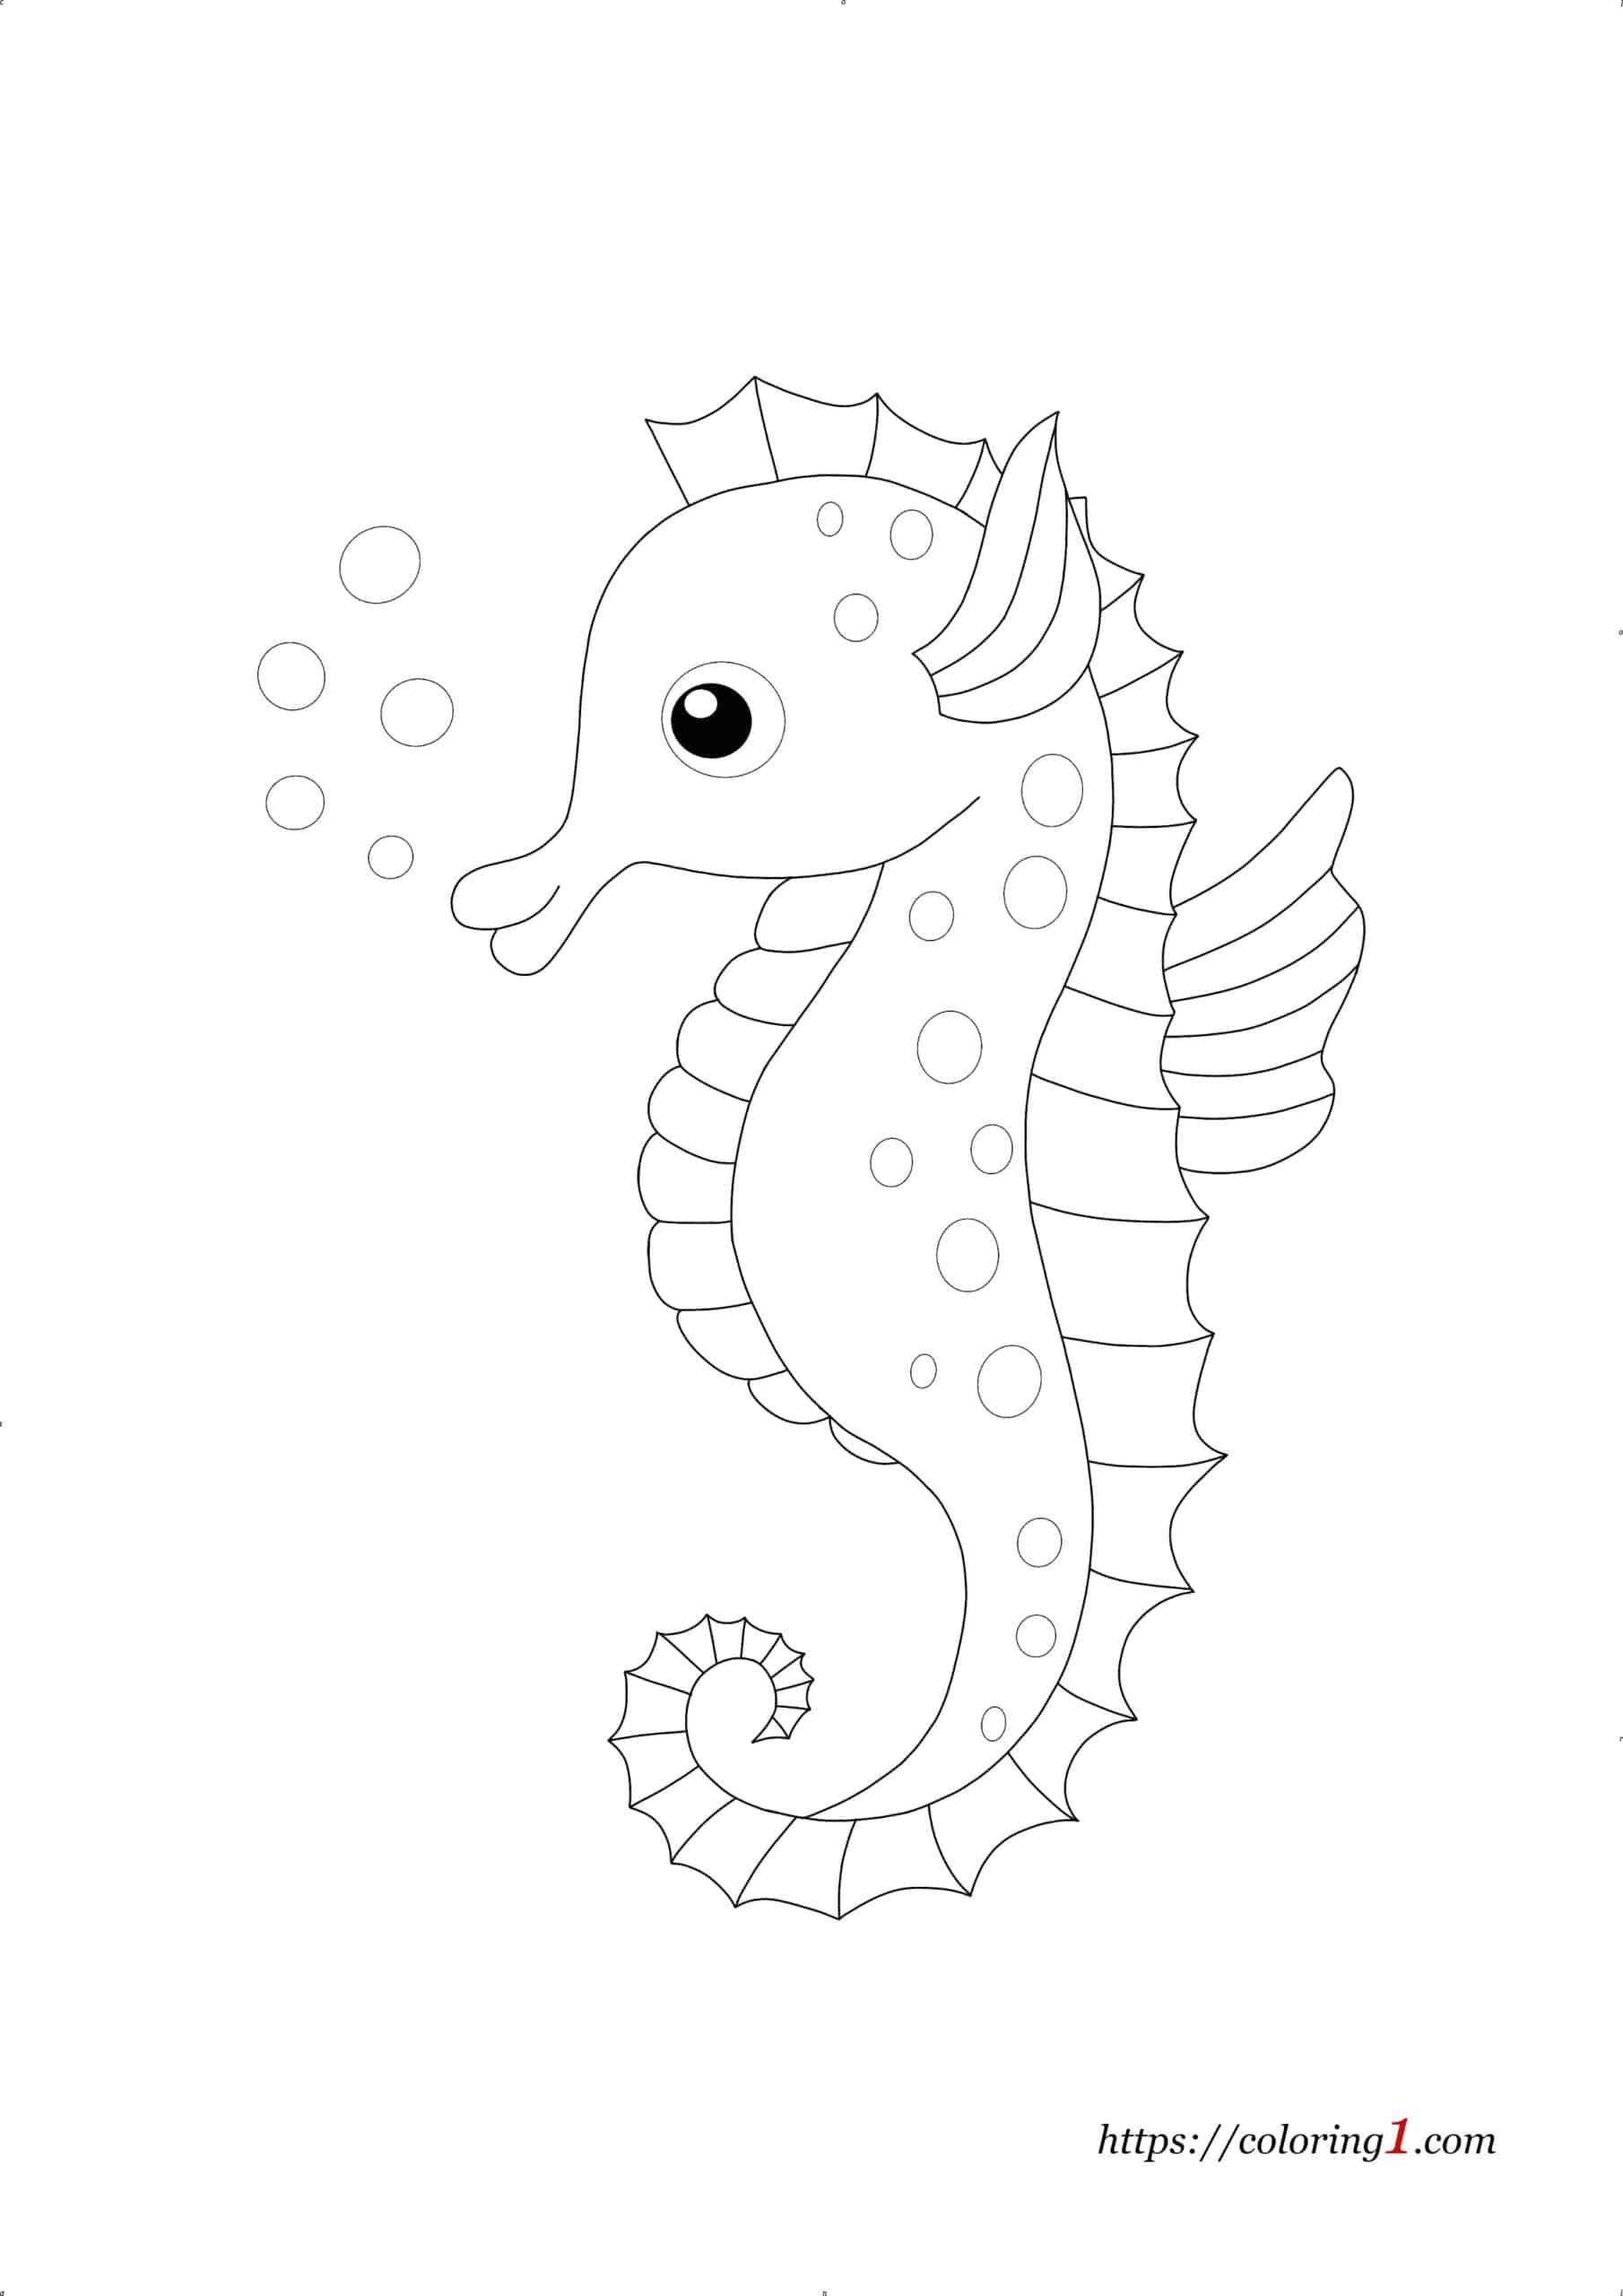 Sea Horse coloring page